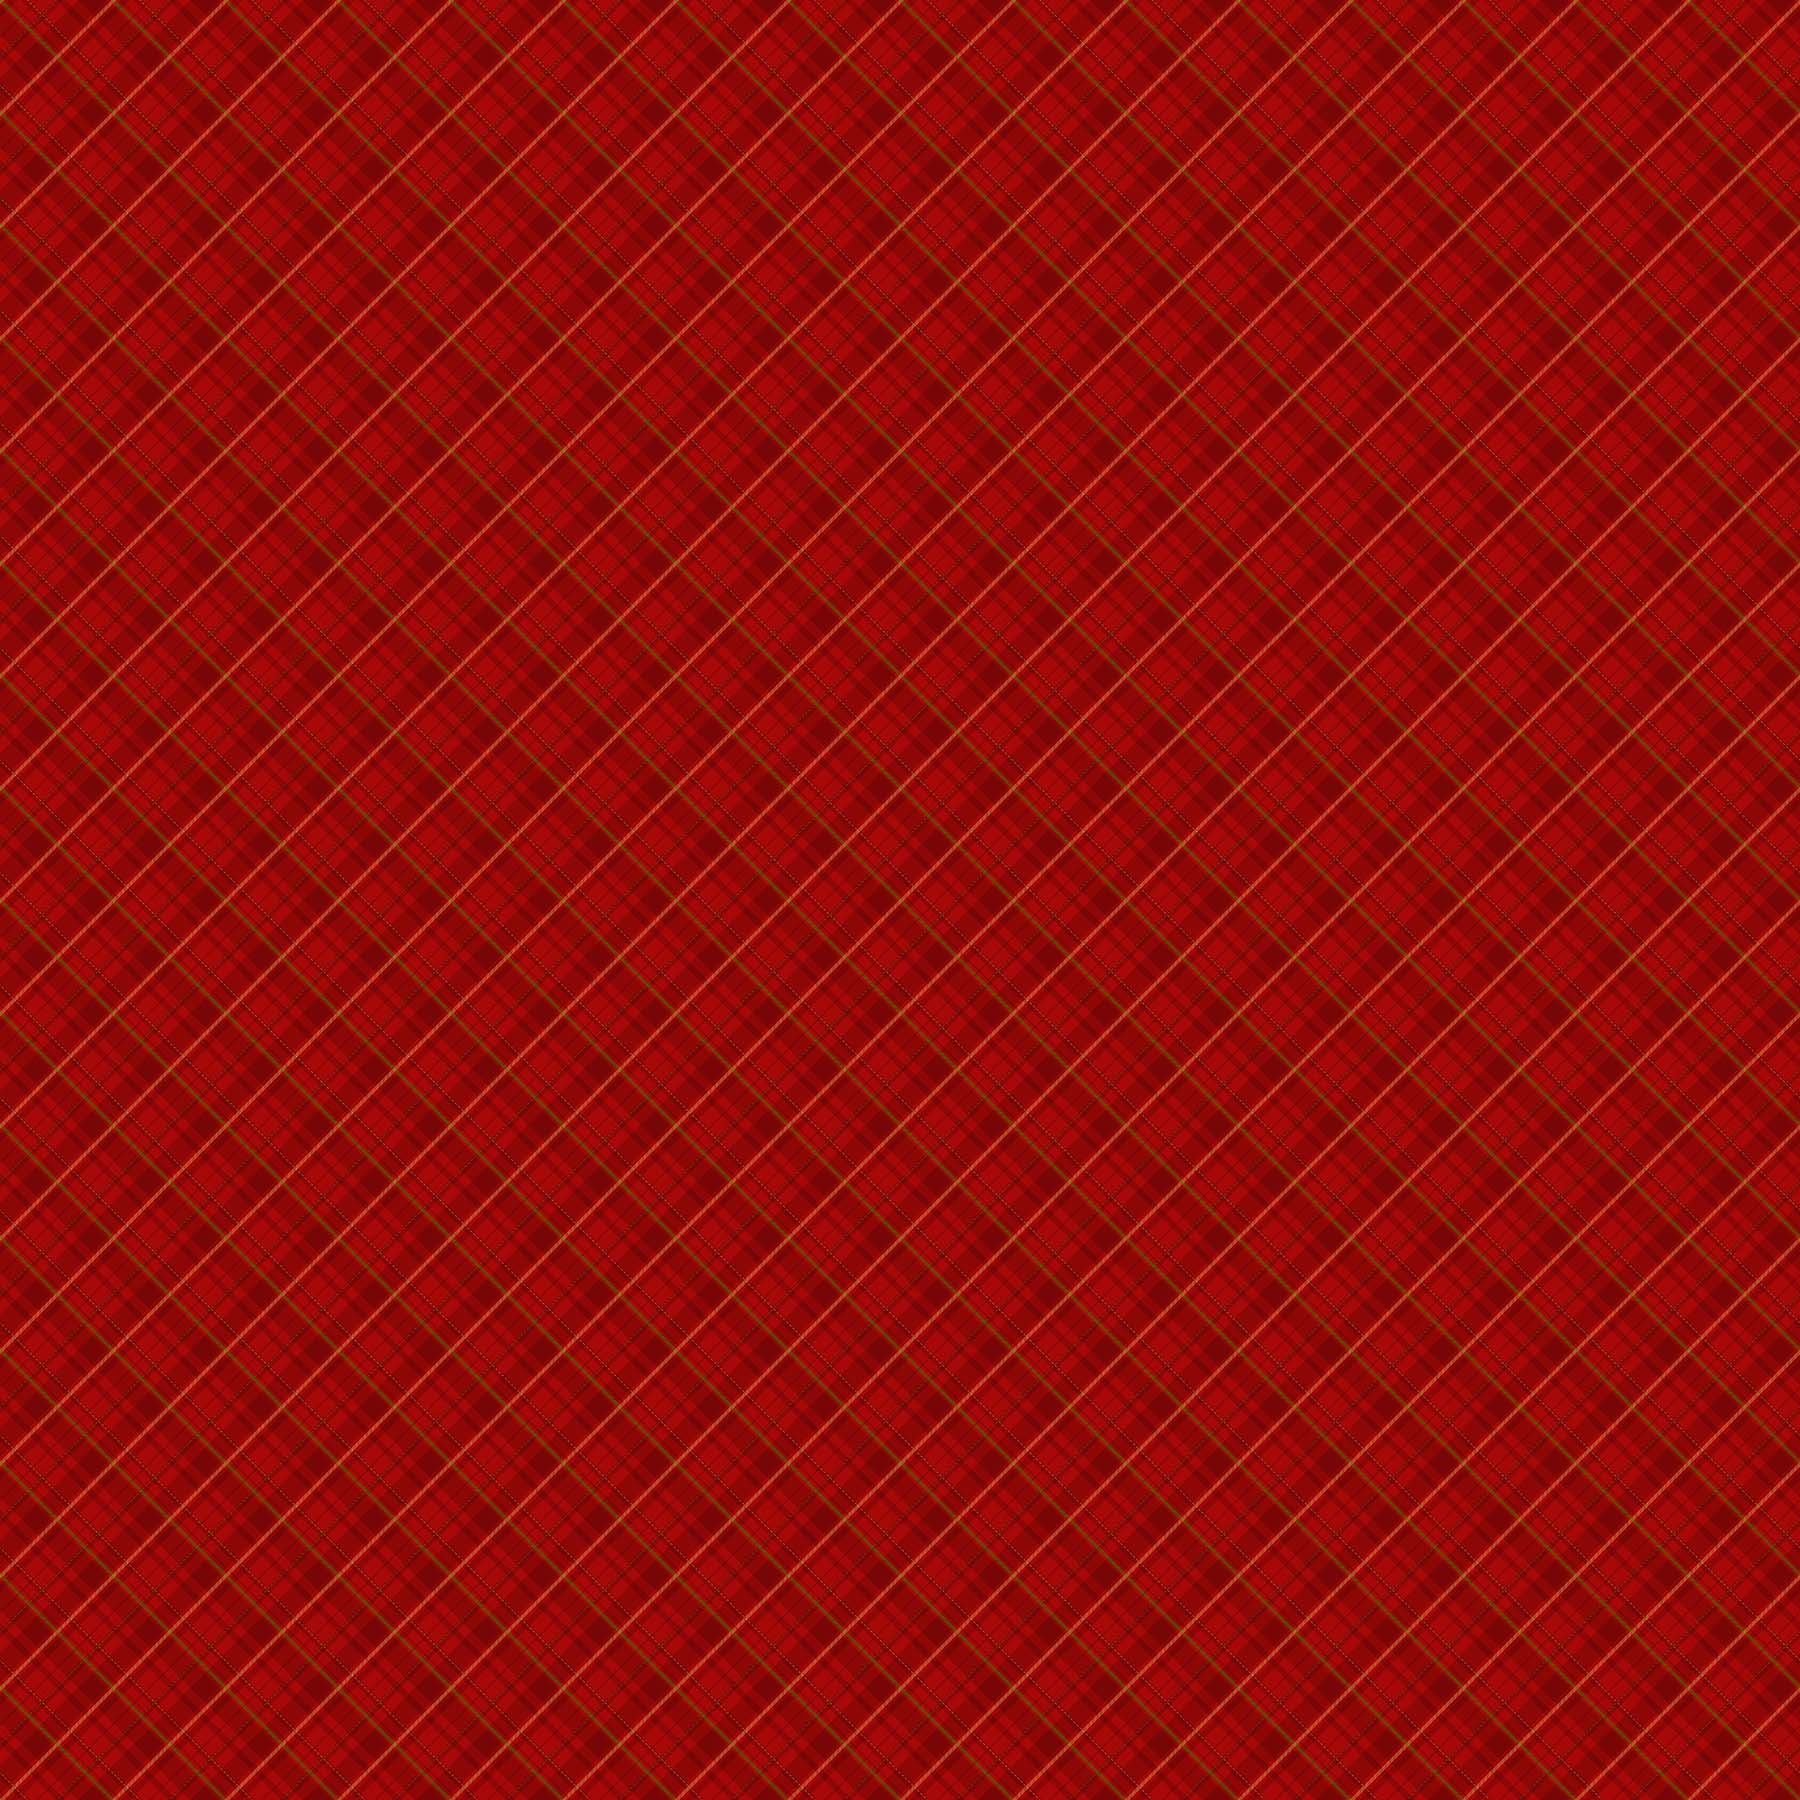 Old Time Christmas Diagonal Plaid Red 24139 24